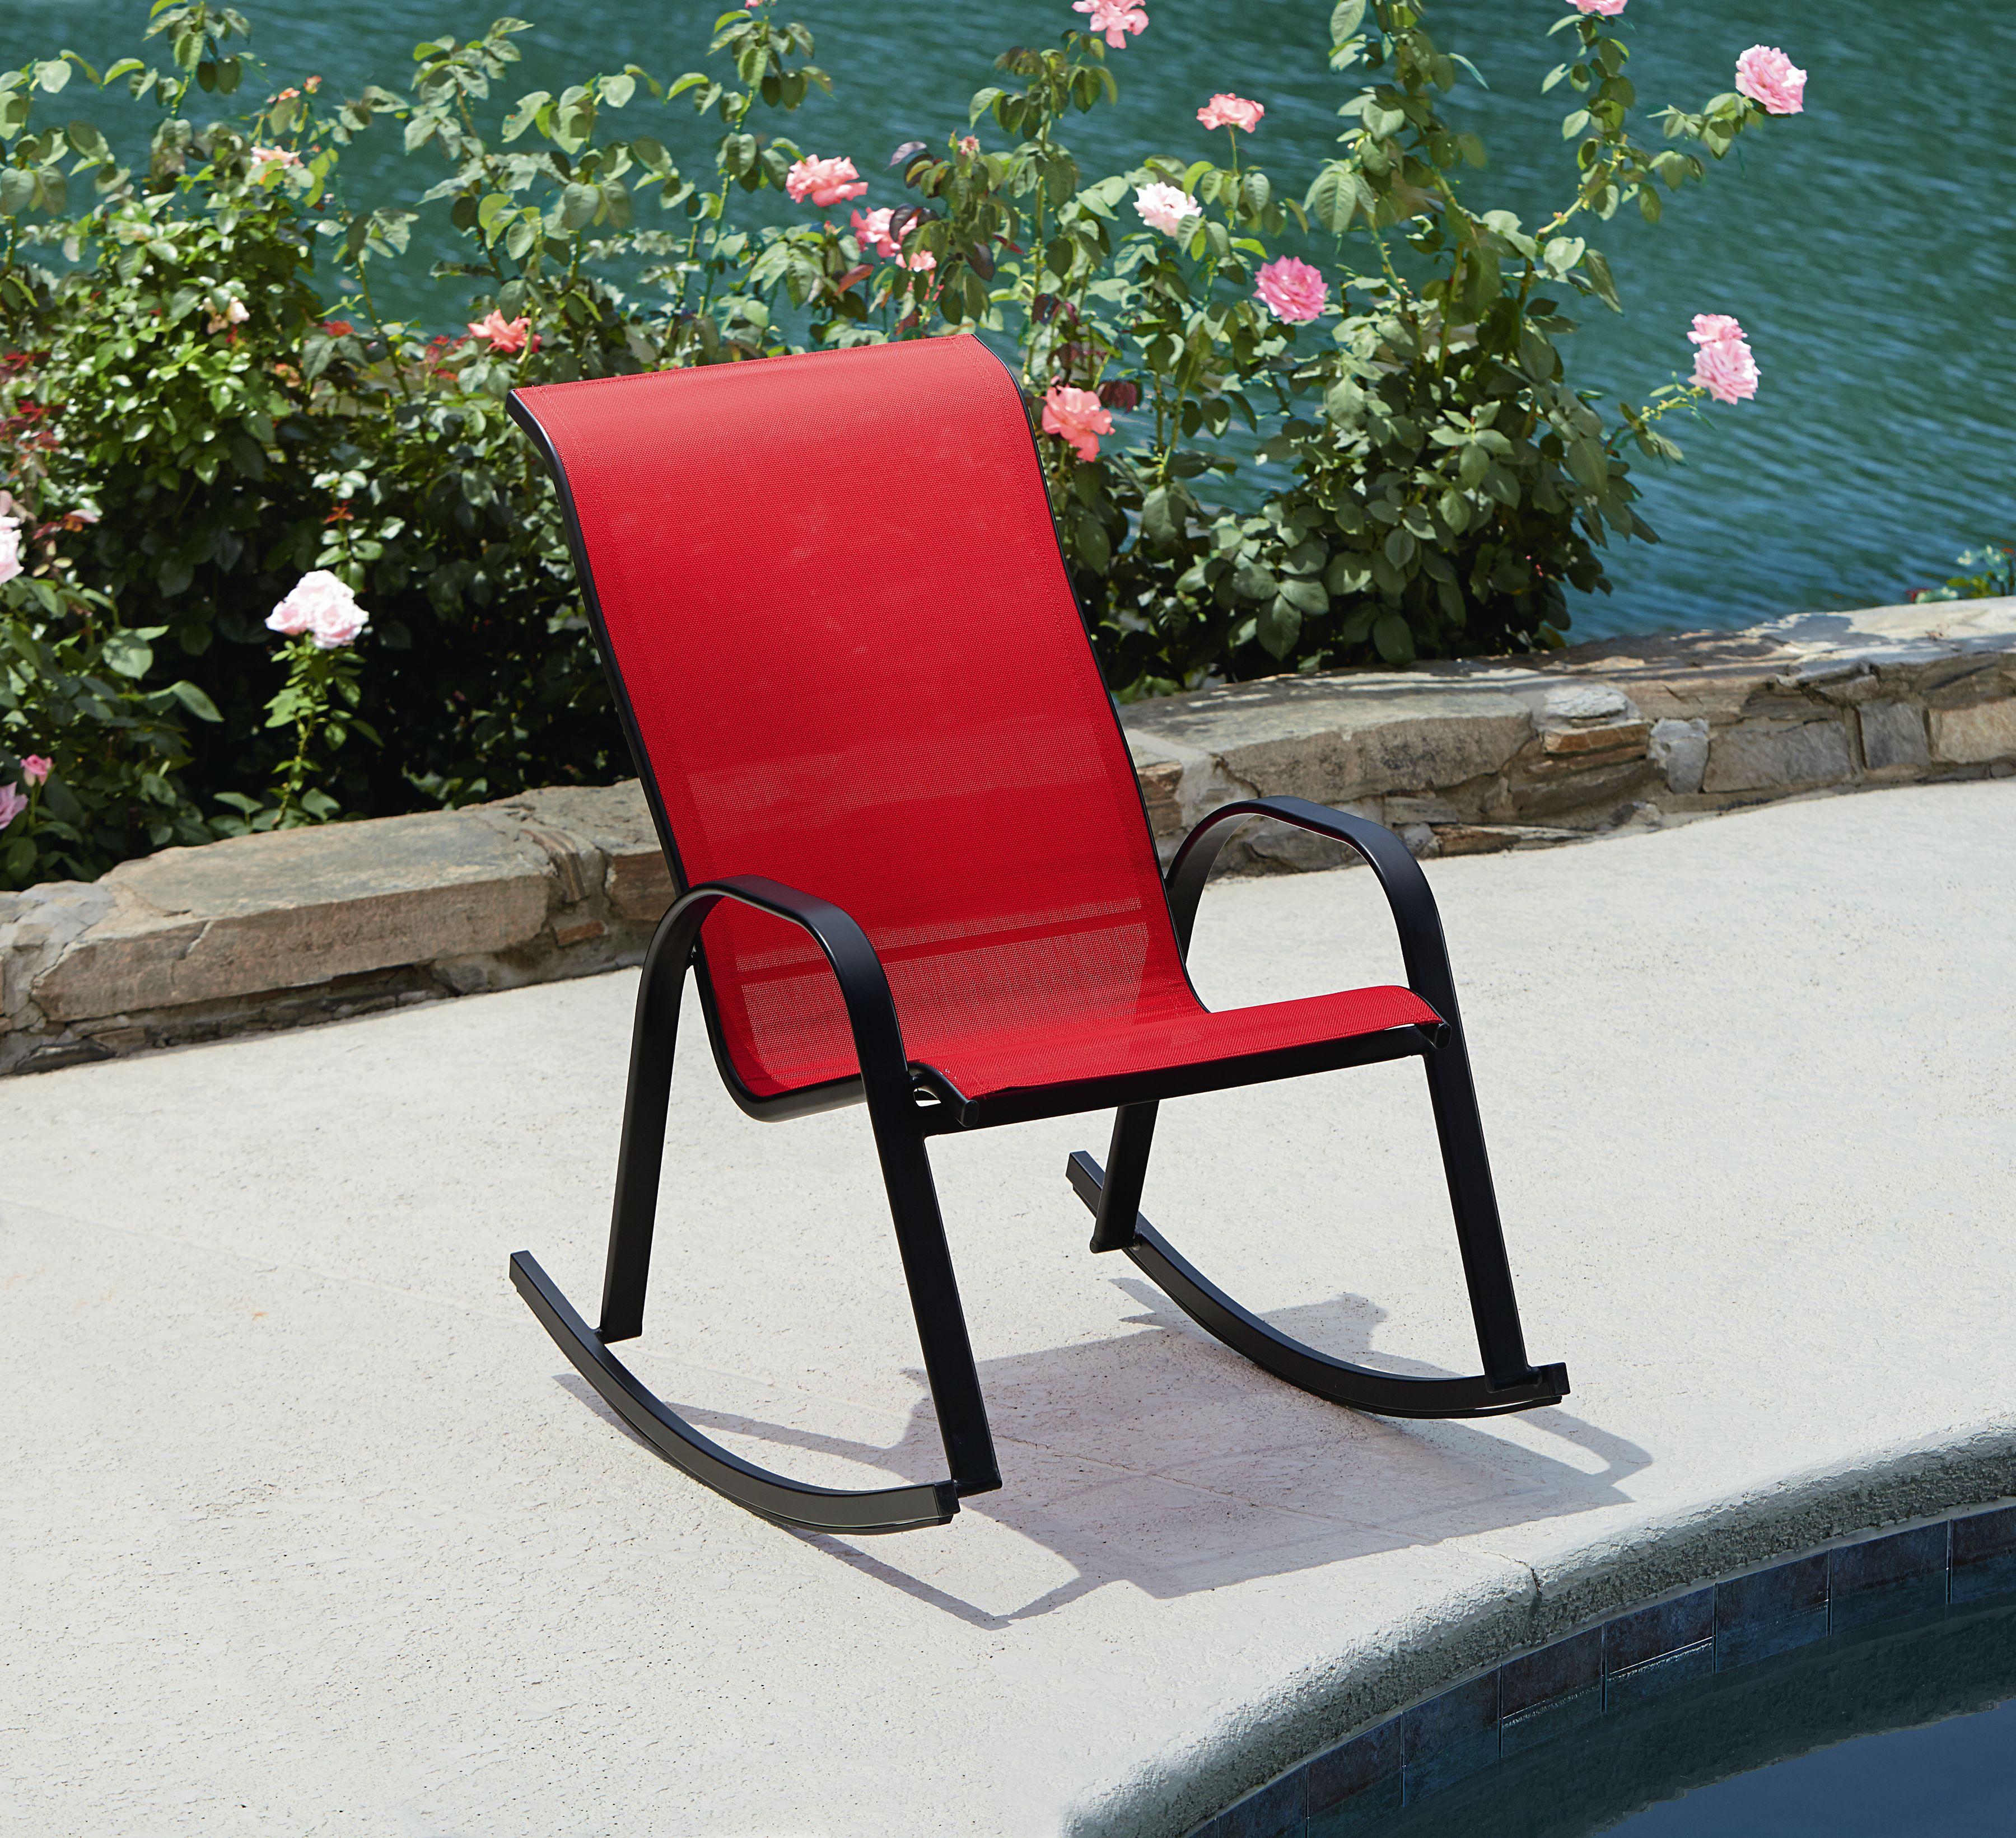 Essential Garden Bartlett Rocker- Red - Outdoor Living